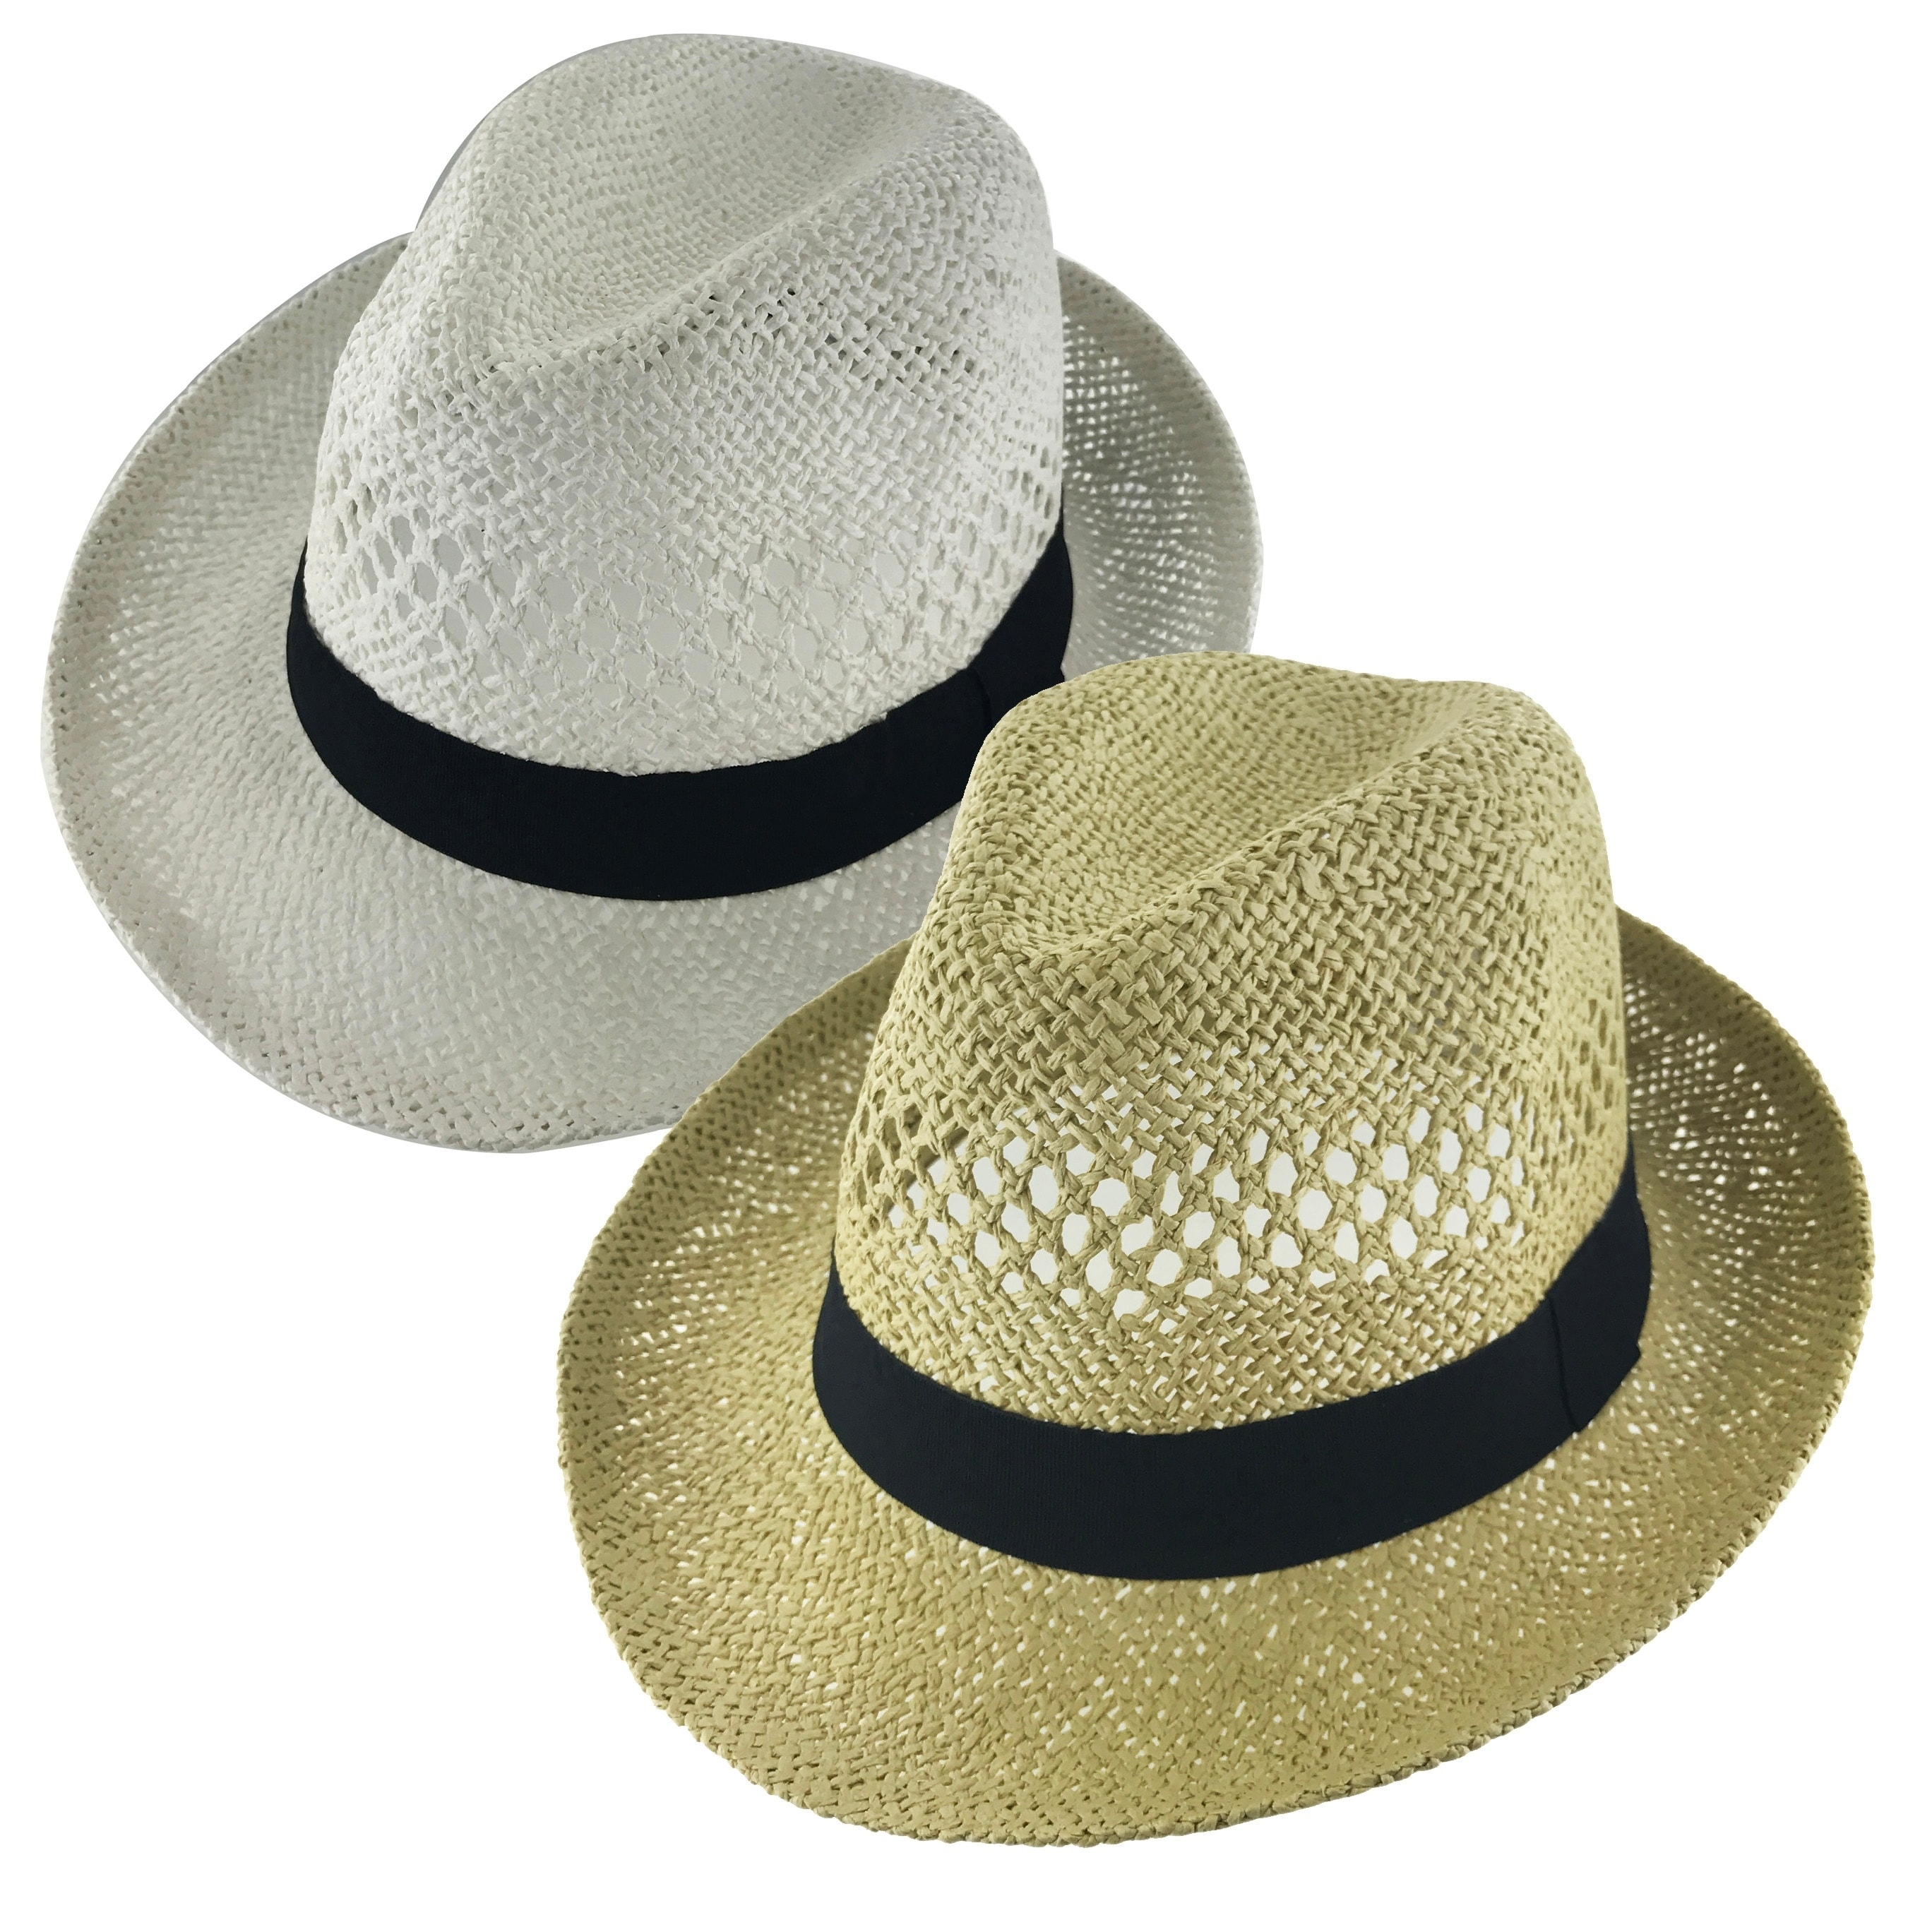 3b069214dc Faddism Unisex Vented Ribbon Cuban Brim Fedora Straw Hat Model 215